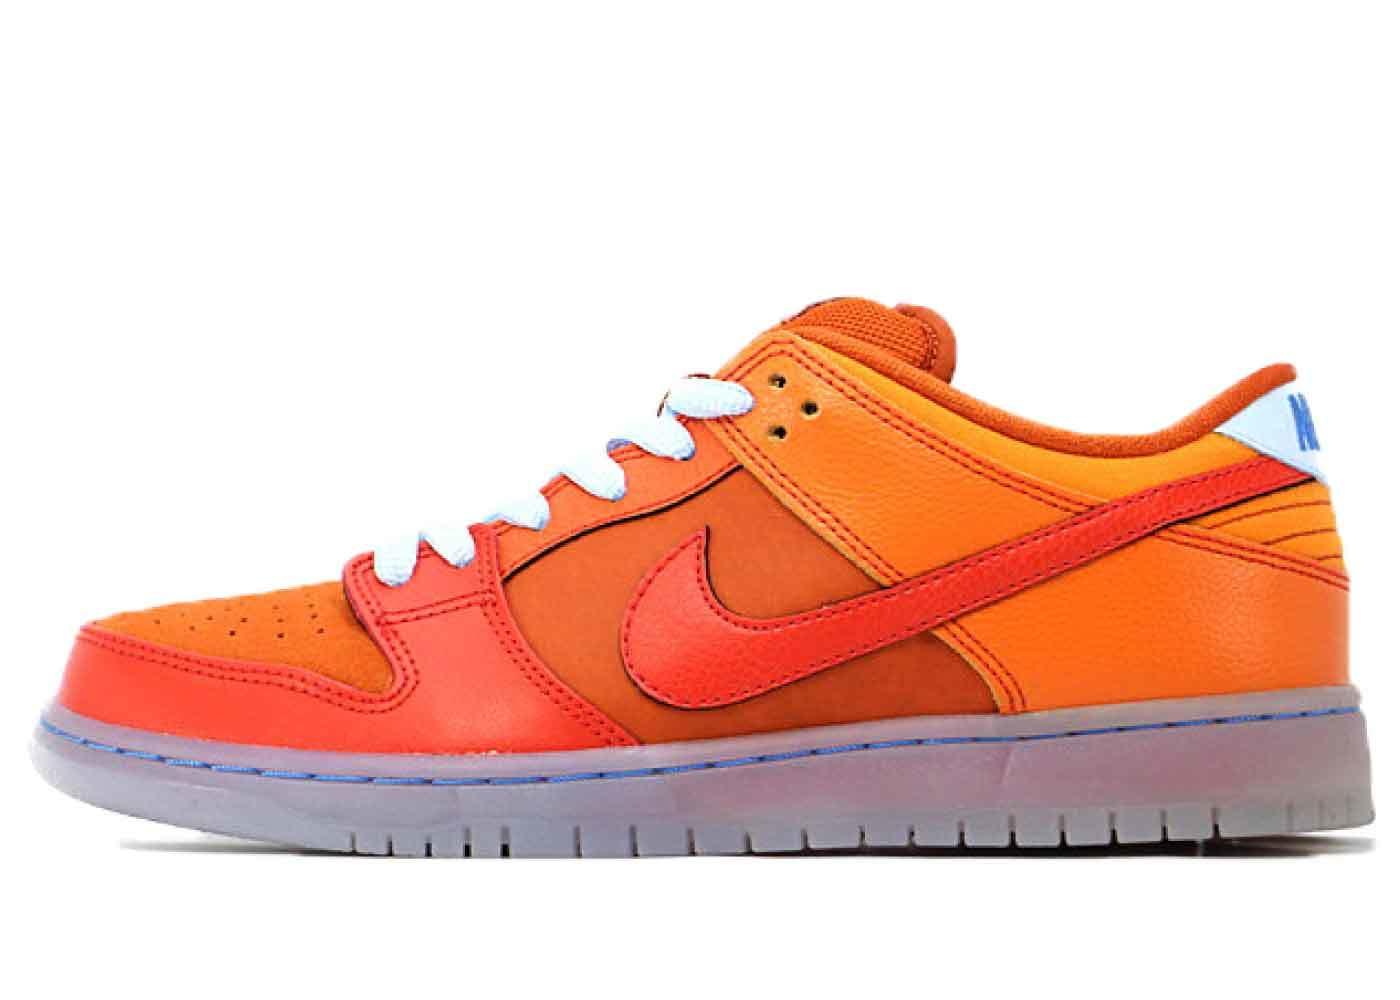 Nike Dunk SB Low Gamma Orangeの写真